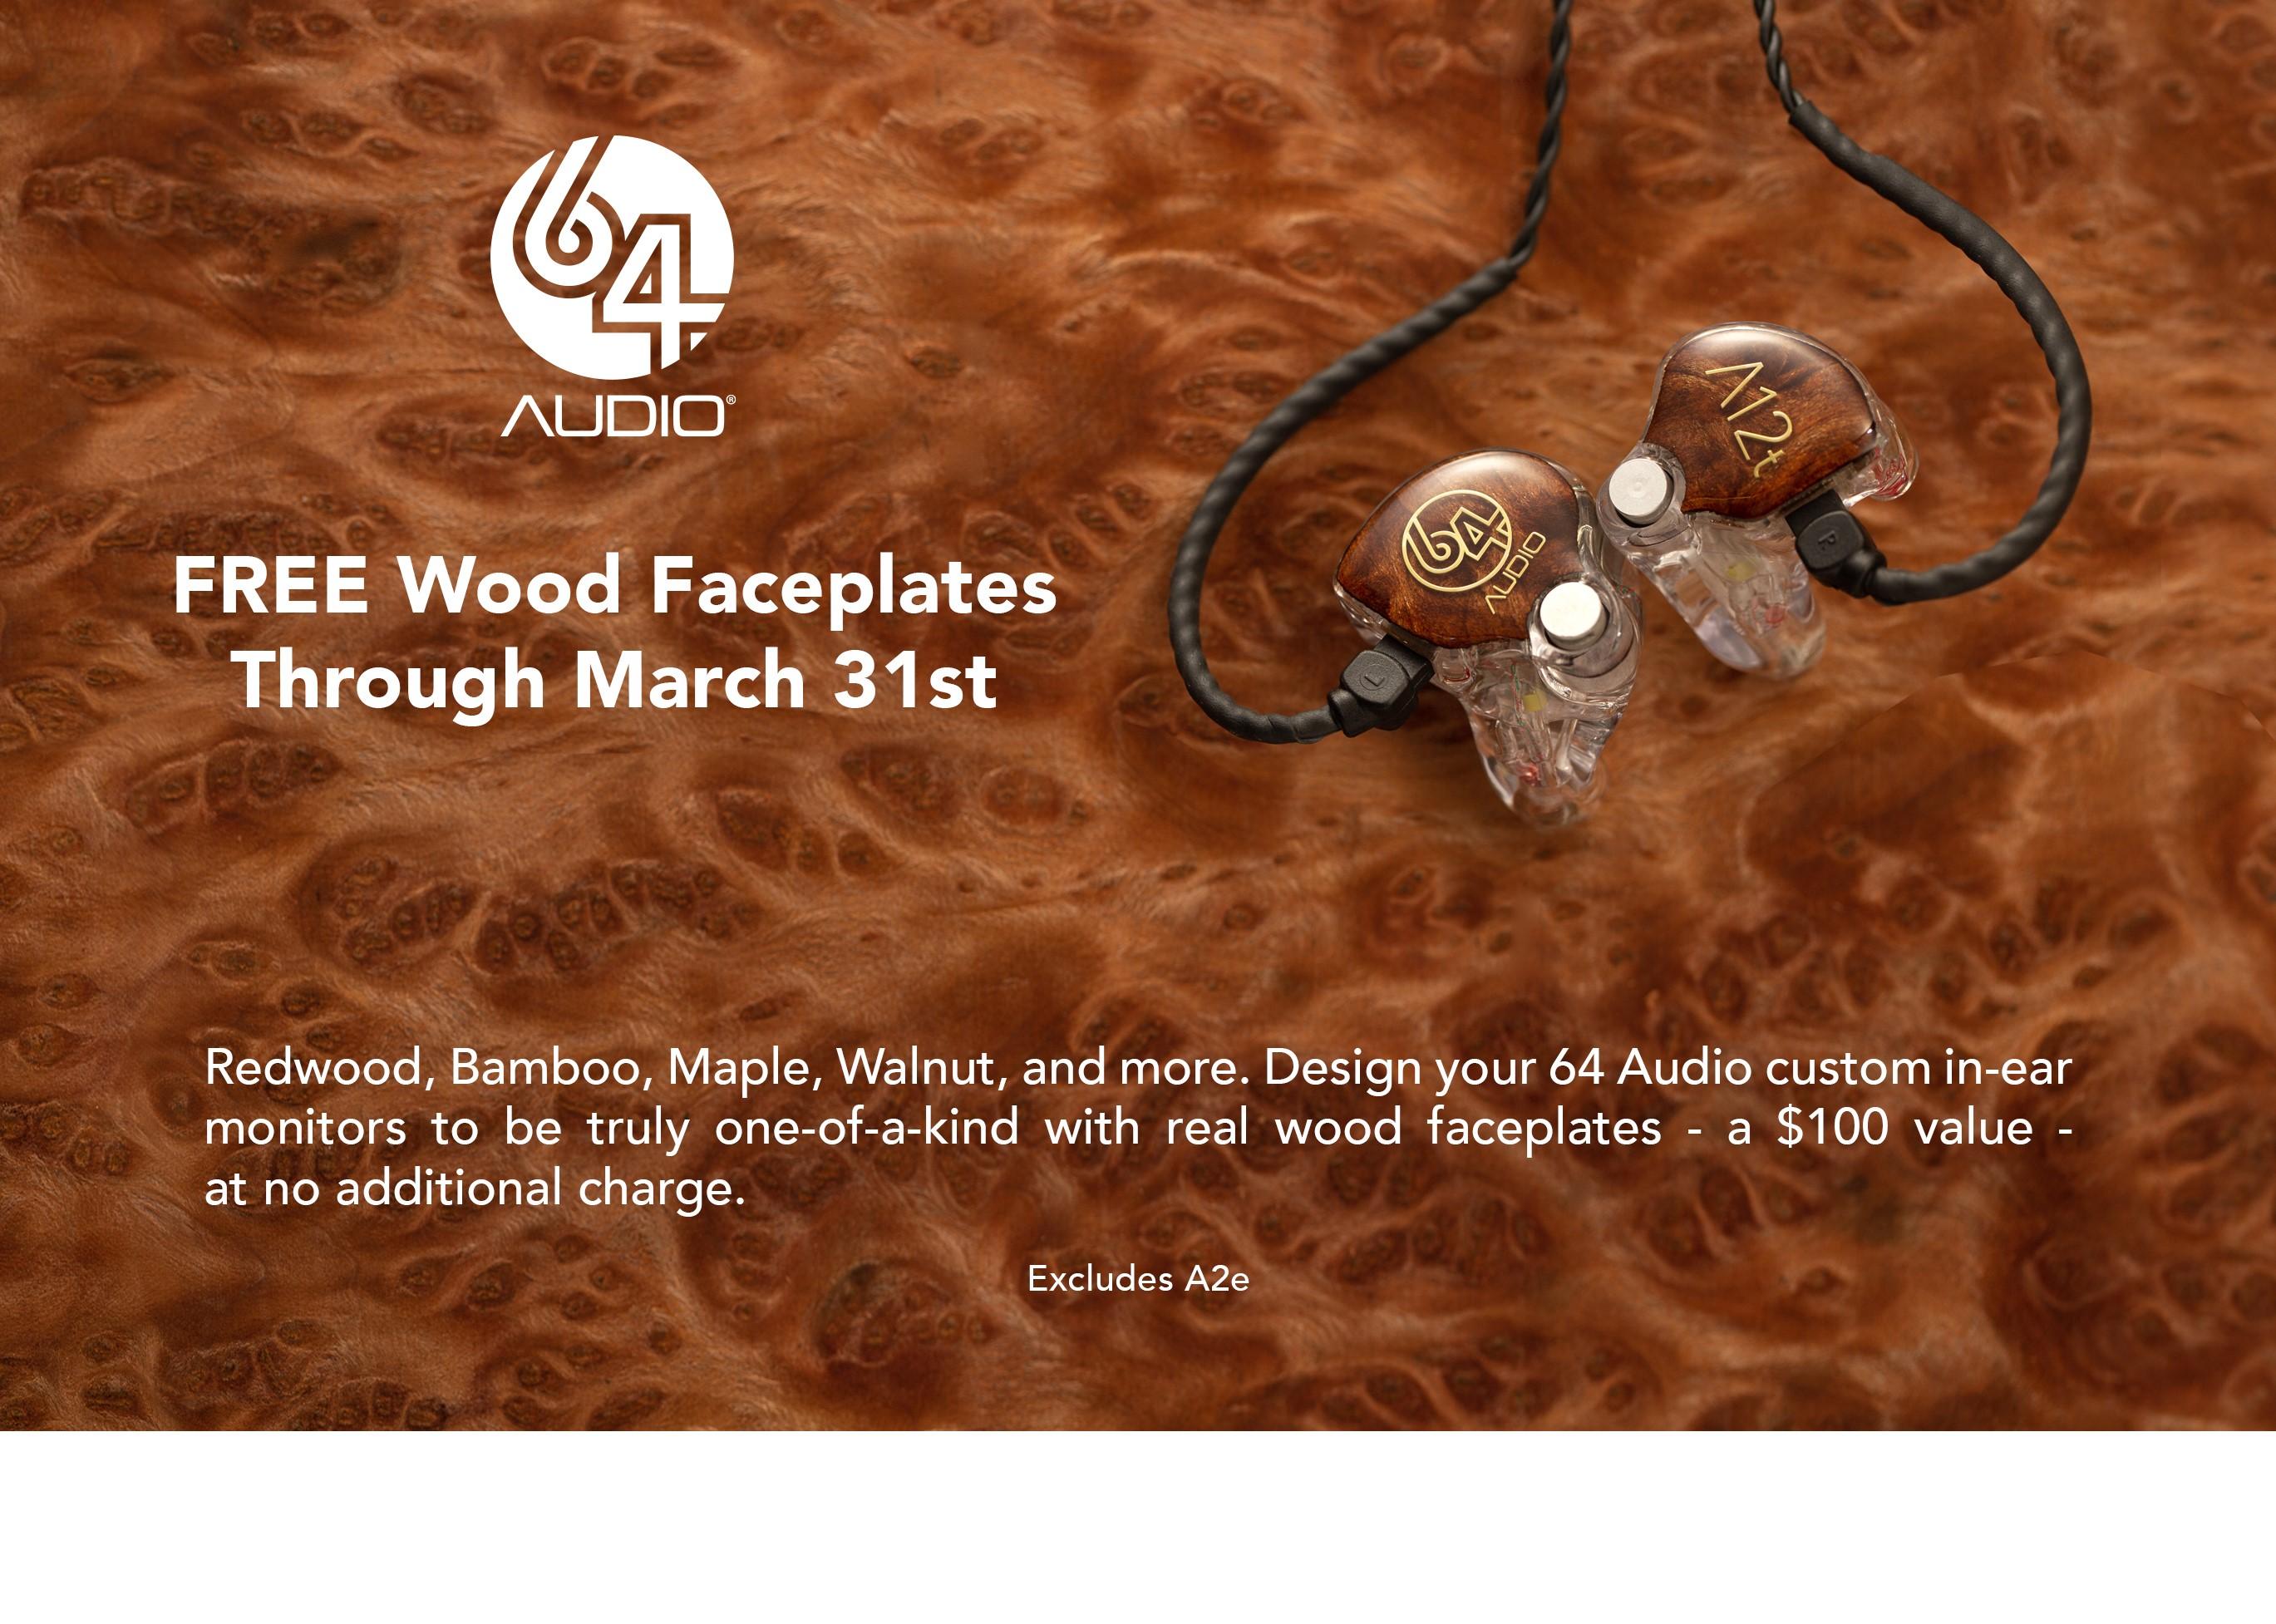 Musician Monitors of NY JHAudio Special Wood You,